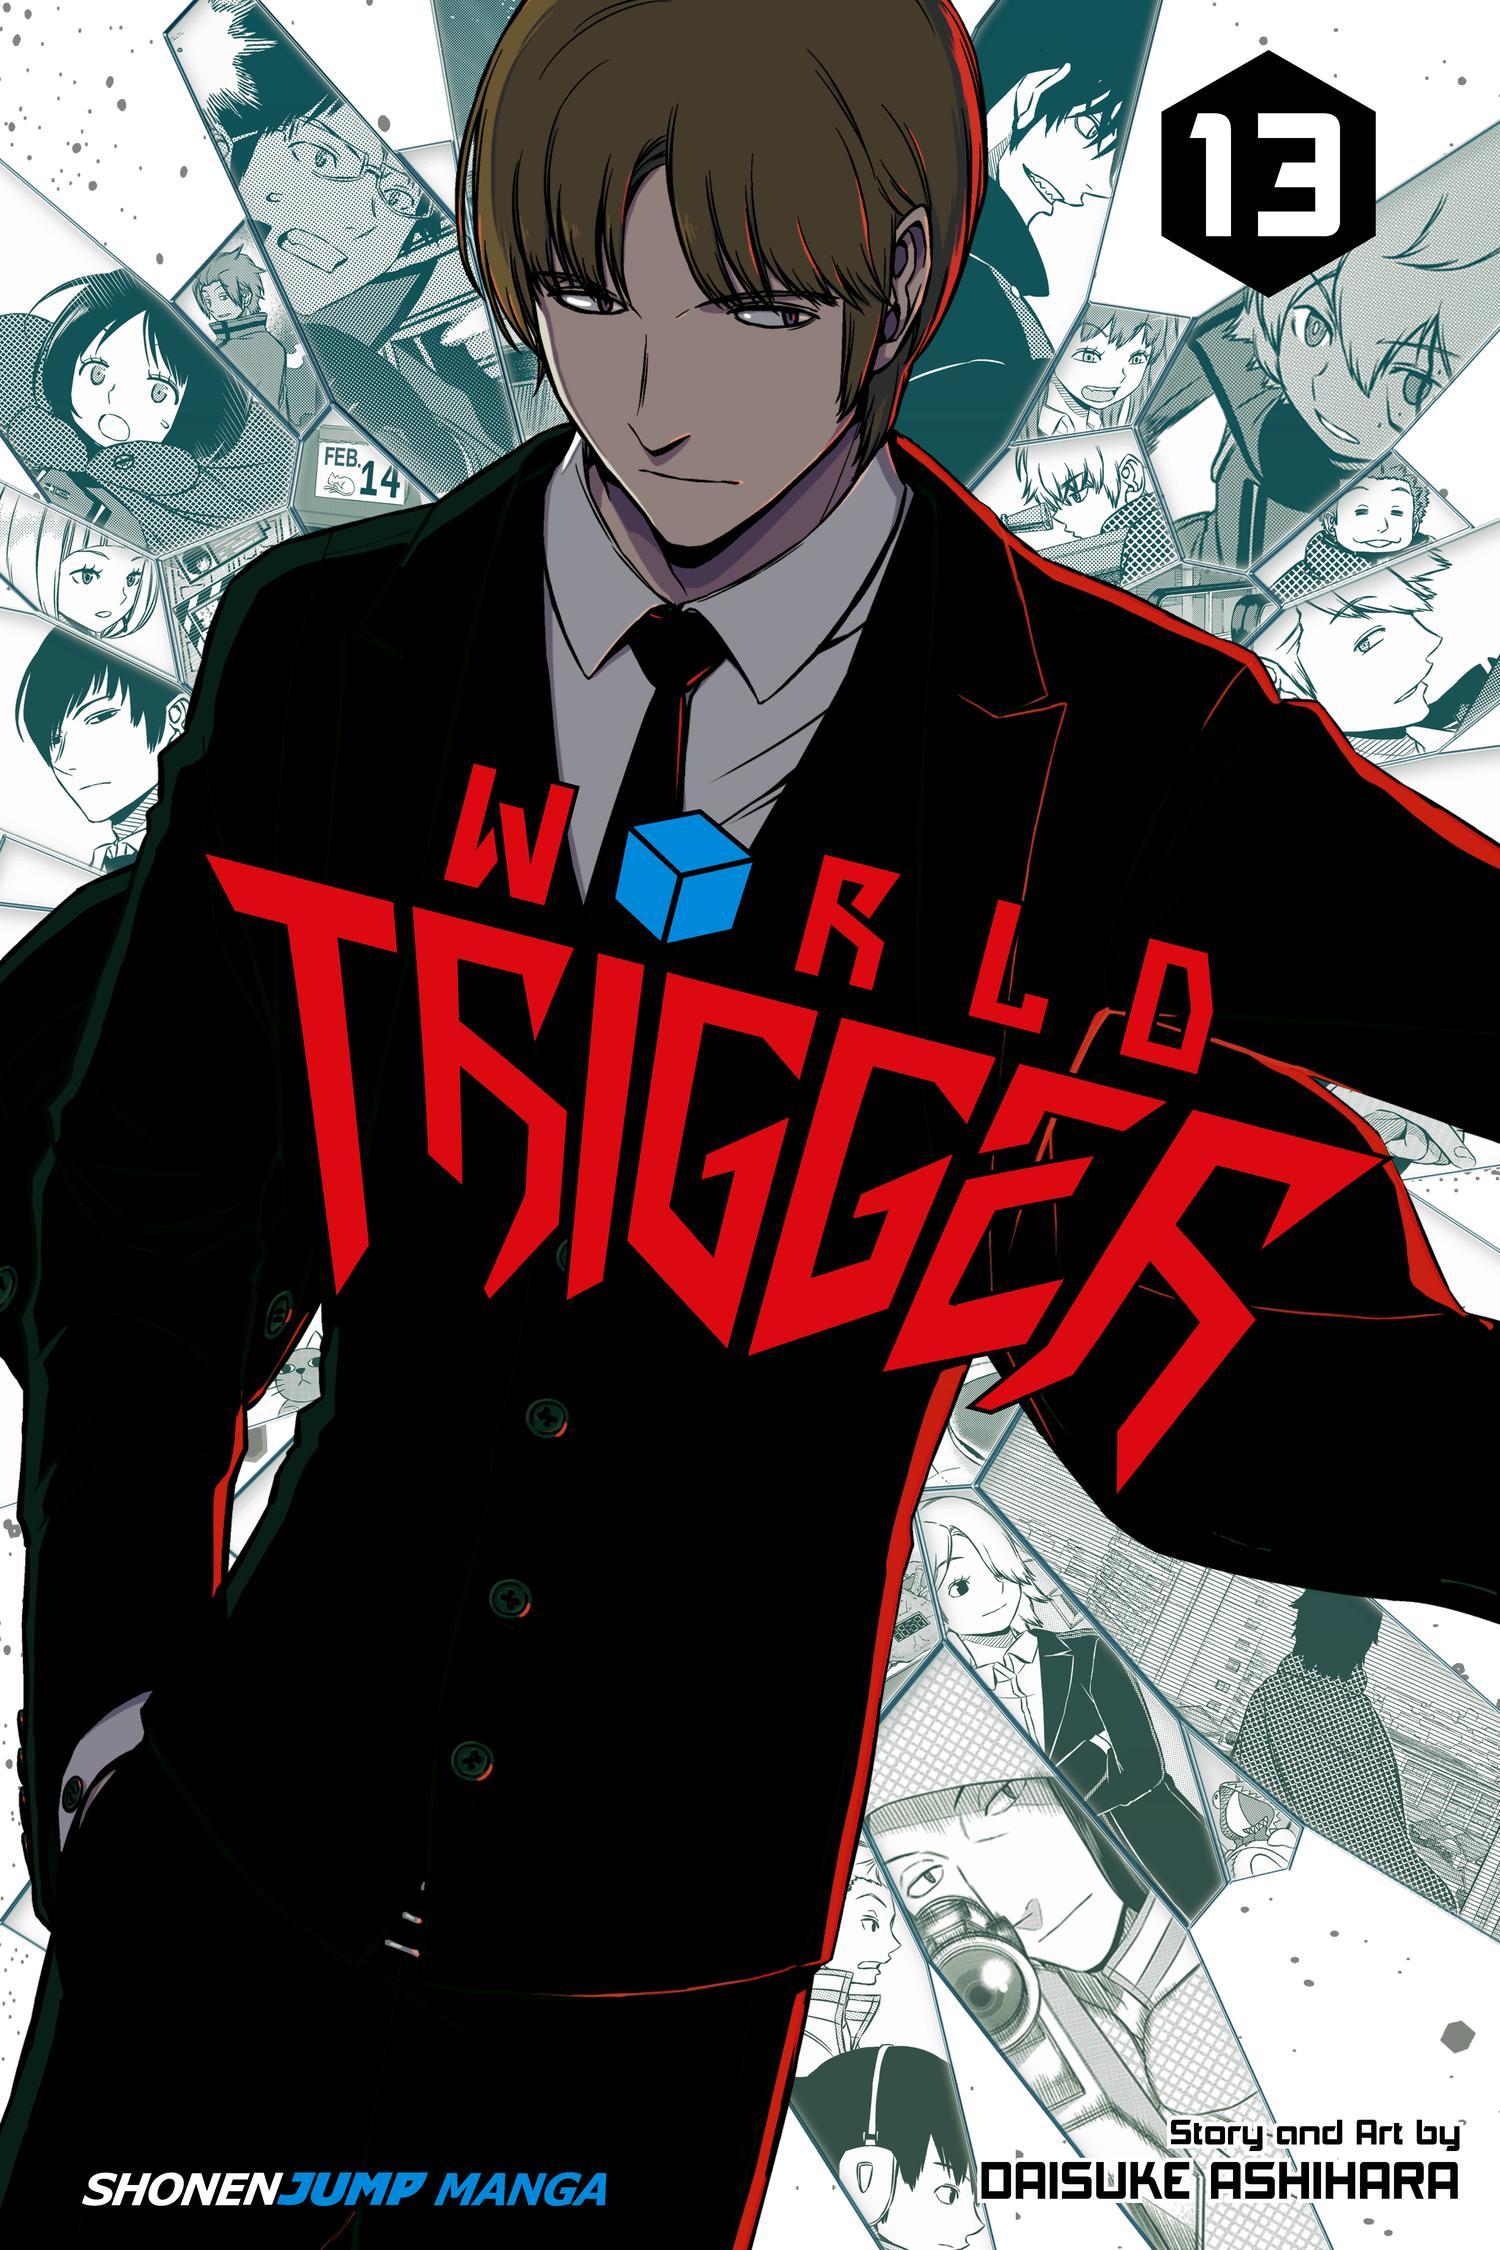 World Trigger v13 2016 Digital LuCaZ